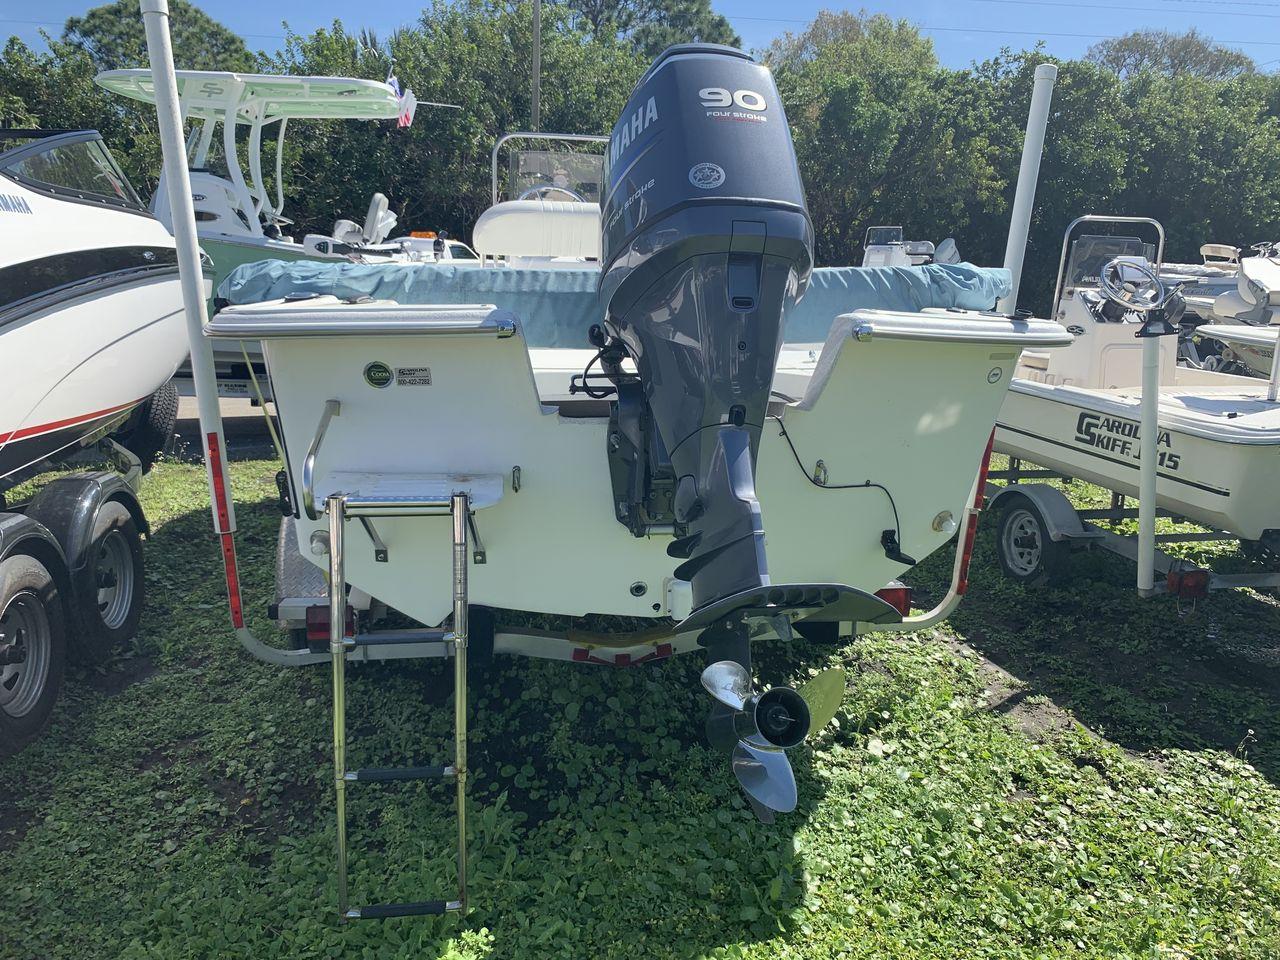 2011 Used Carolina Skiff Flats Fishing Boat For Sale